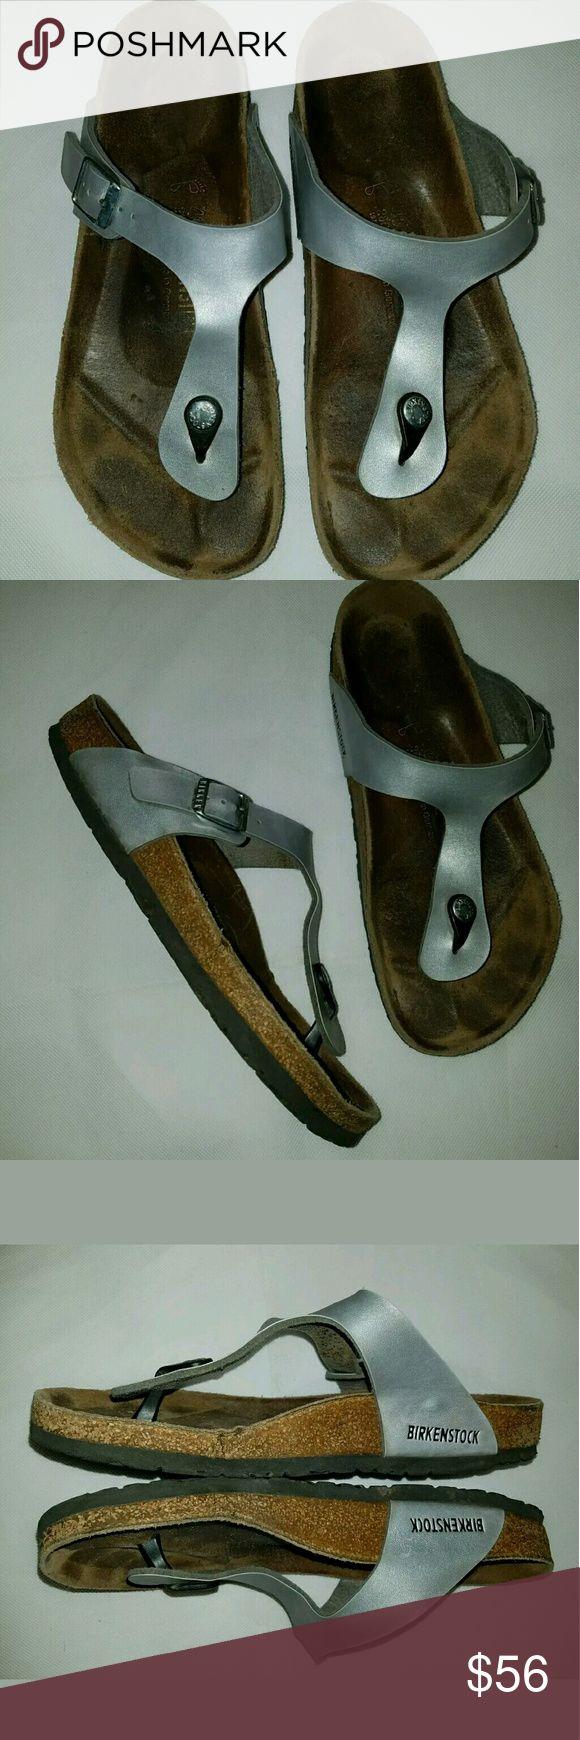 Birkenstock Gizeh Silver Flip Flop Sandals Birkenstock Gizeh Metallic Flip Flop Sandals Size 40 / 9.5 10  Shoes have some wear at soles. See pics.  ALB Birkenstock Shoes Sandals